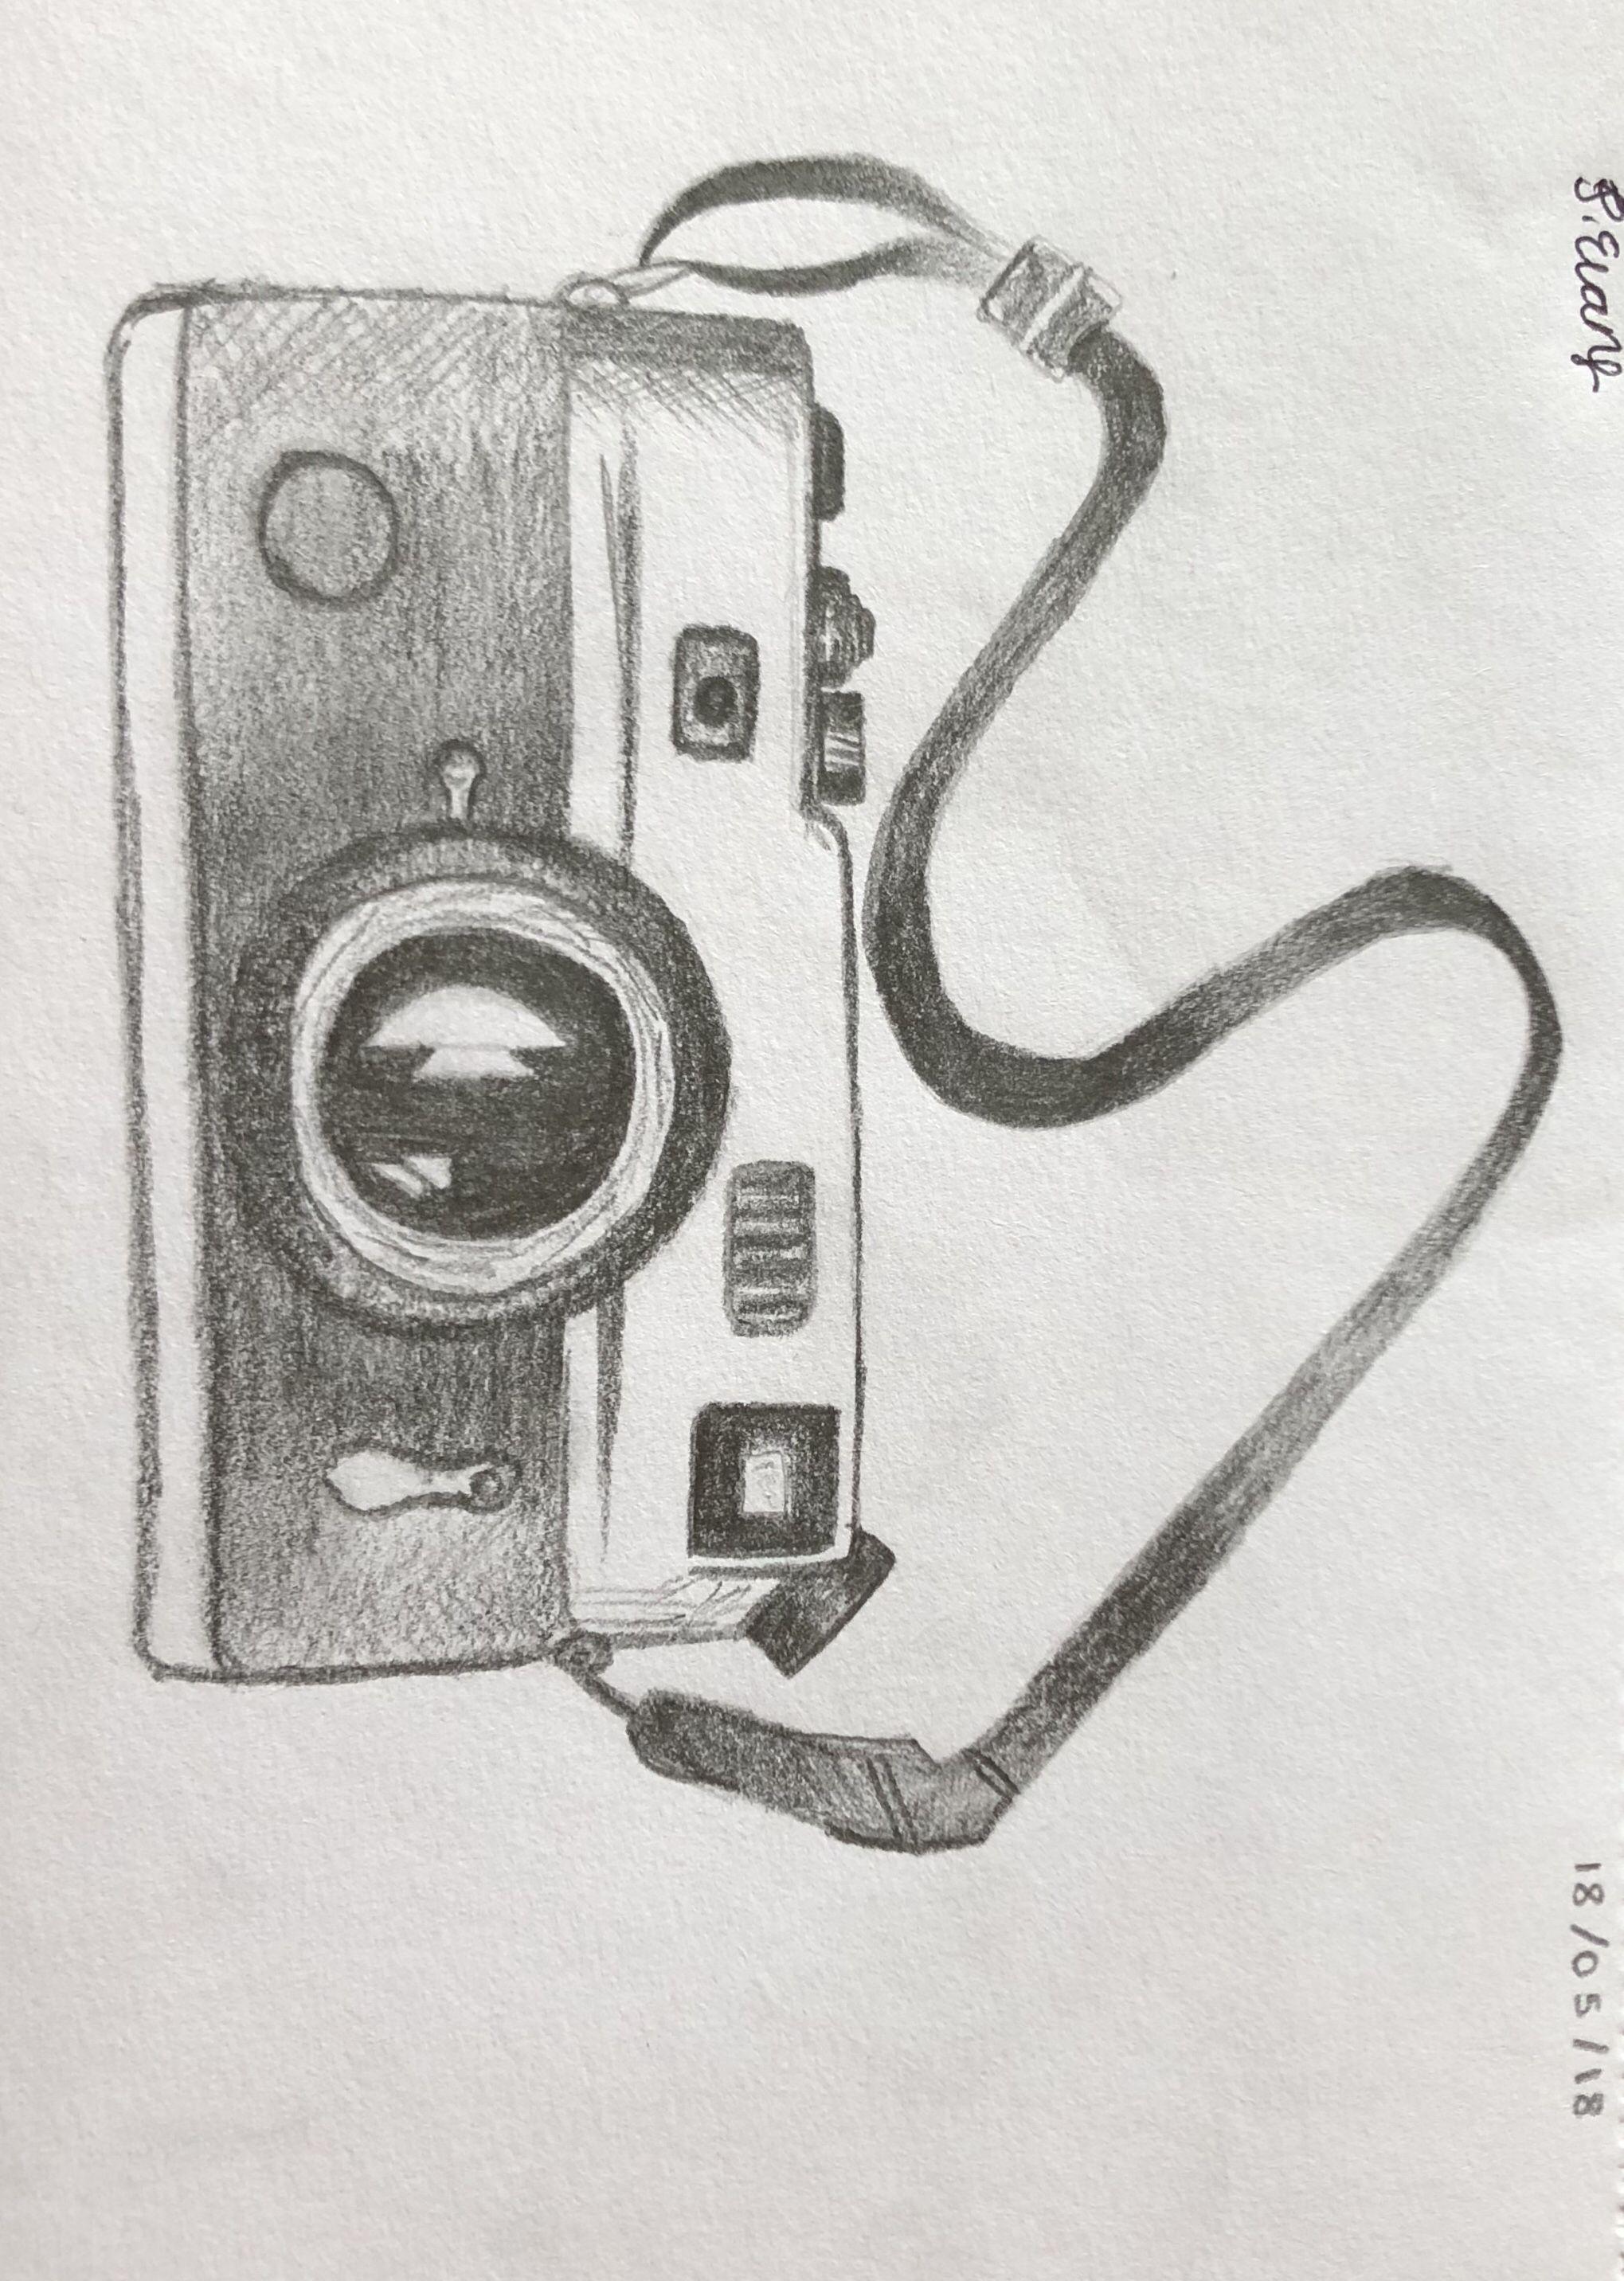 Pencil texture camera drawing comics story drawing sketches pencil drawings drawings